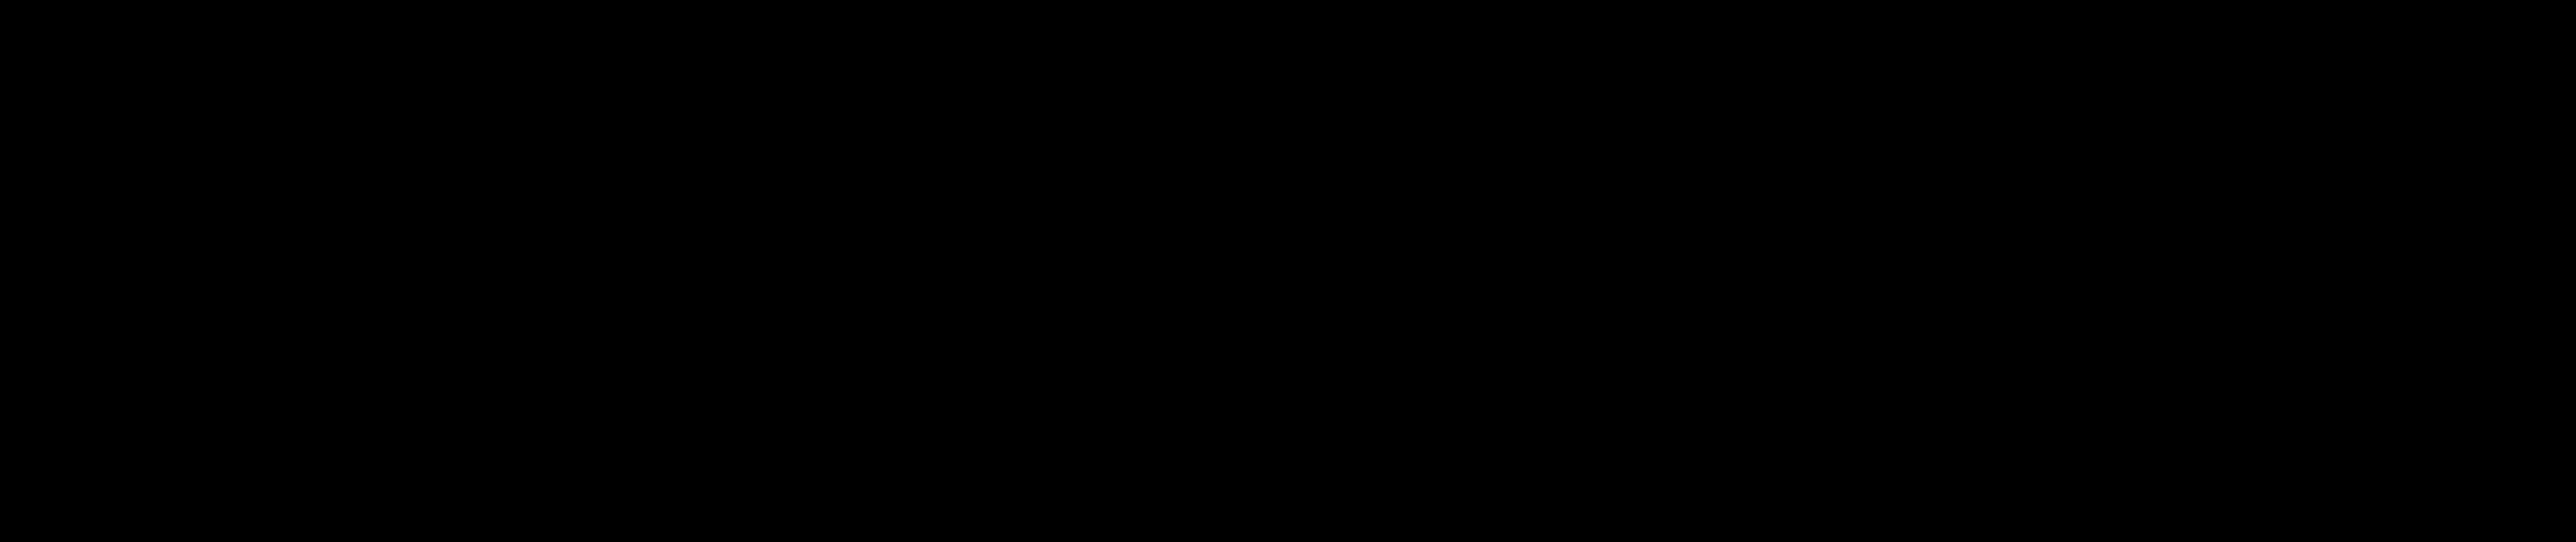 Variant – Commercial Trailer – 3021 P5 (657x210x93 cm)